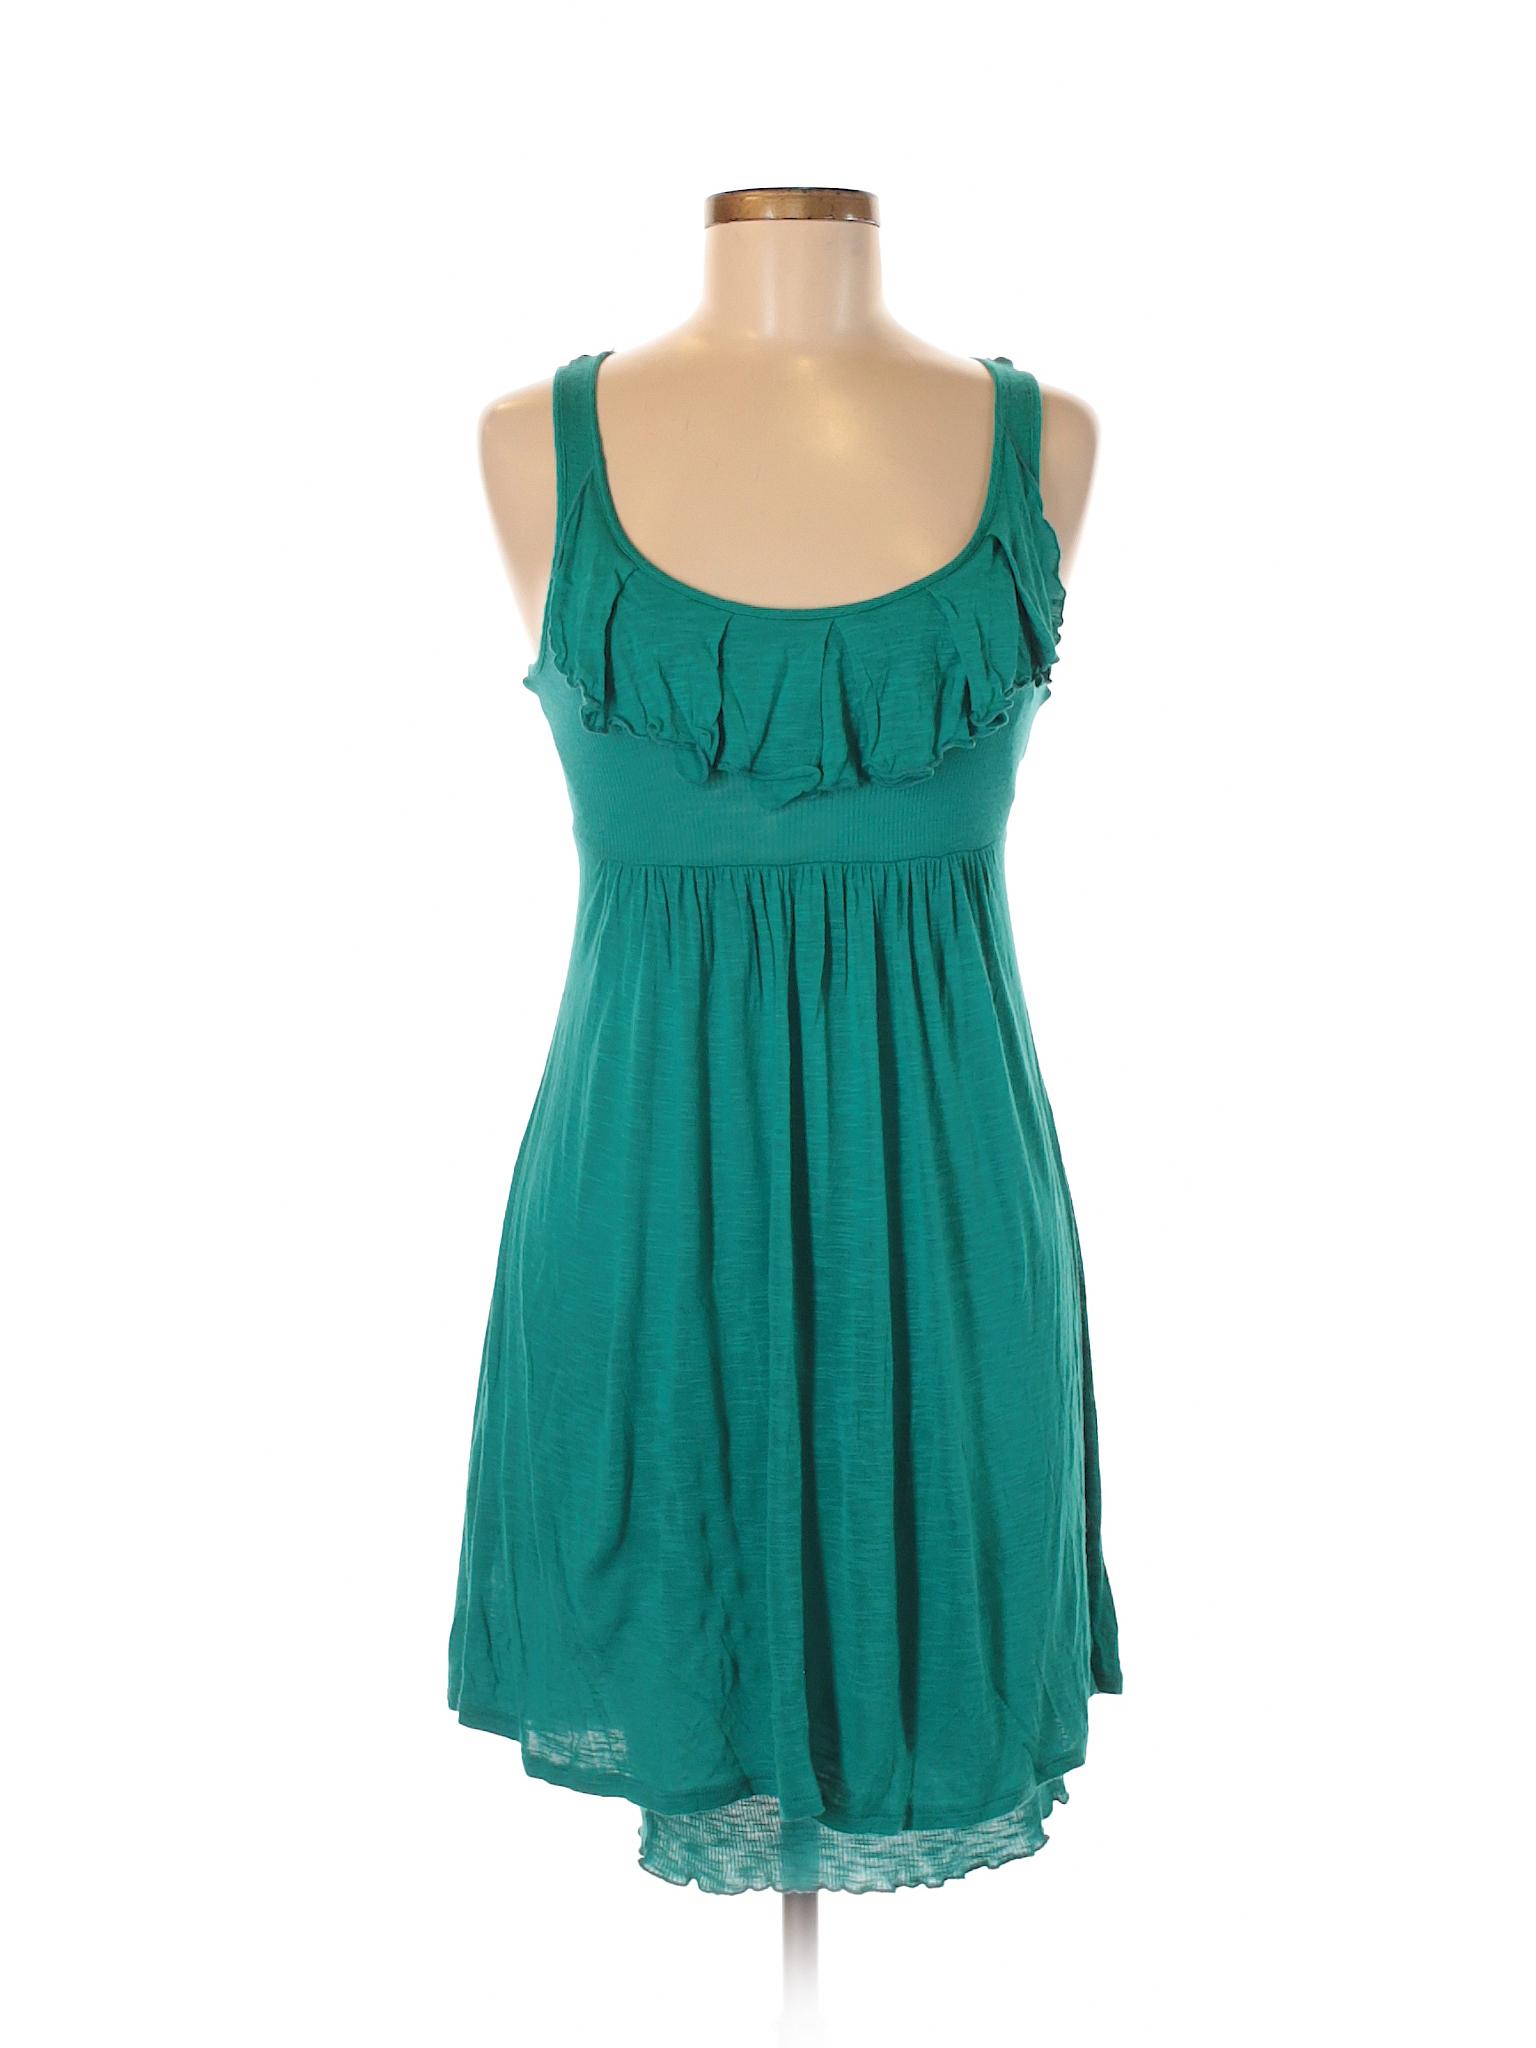 Selling Heaven Casual Dress Blu Selling Dress Casual Selling Blu Heaven qITt5x1